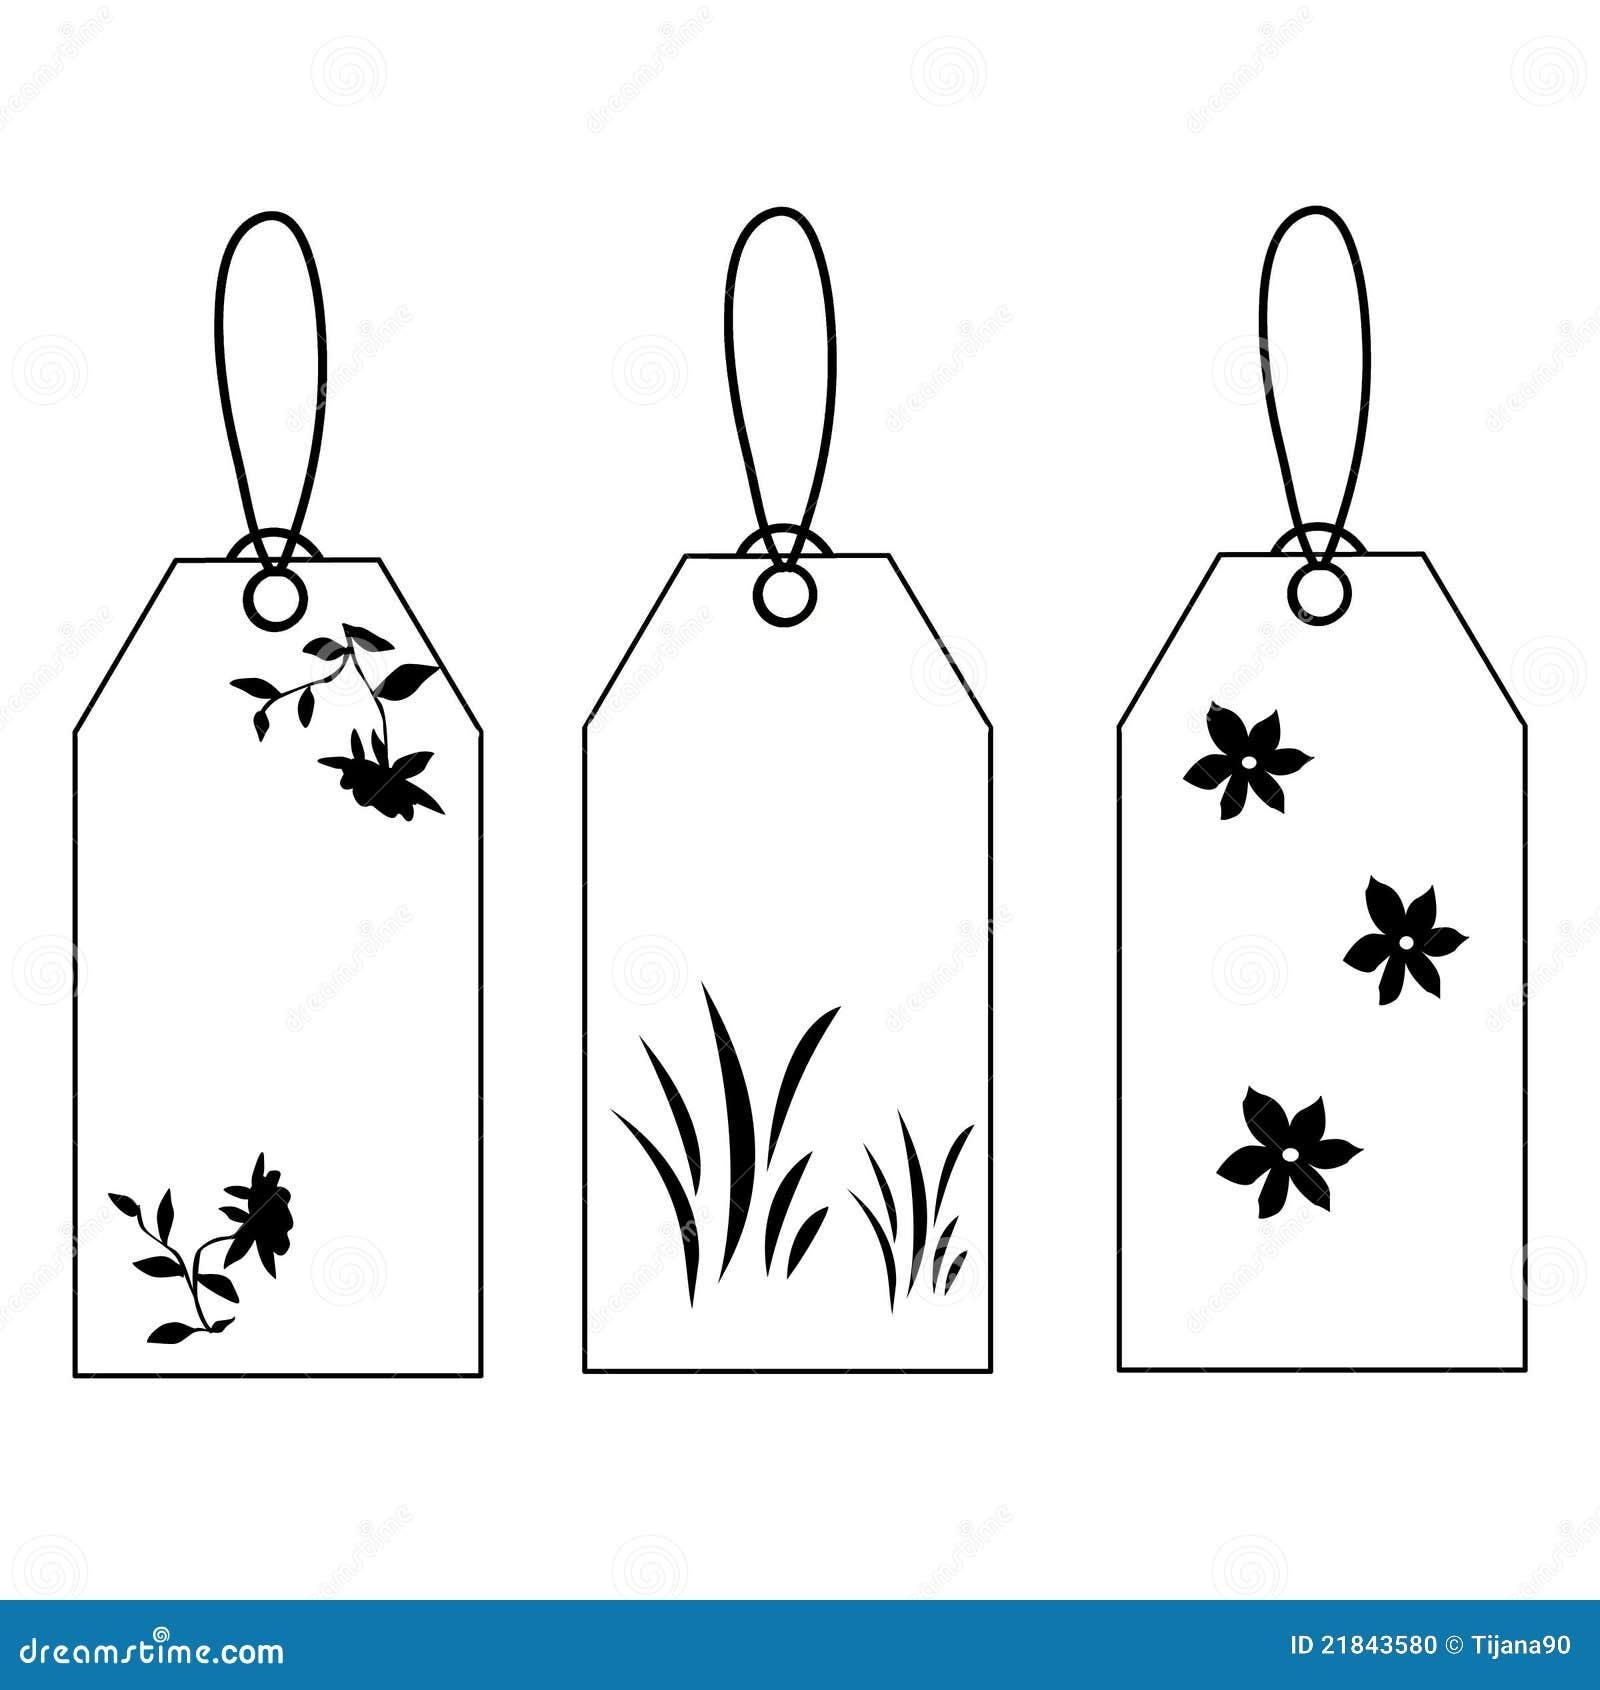 Etiquetas Preto E Branco Ilustracao Stock Ilustracao De Original